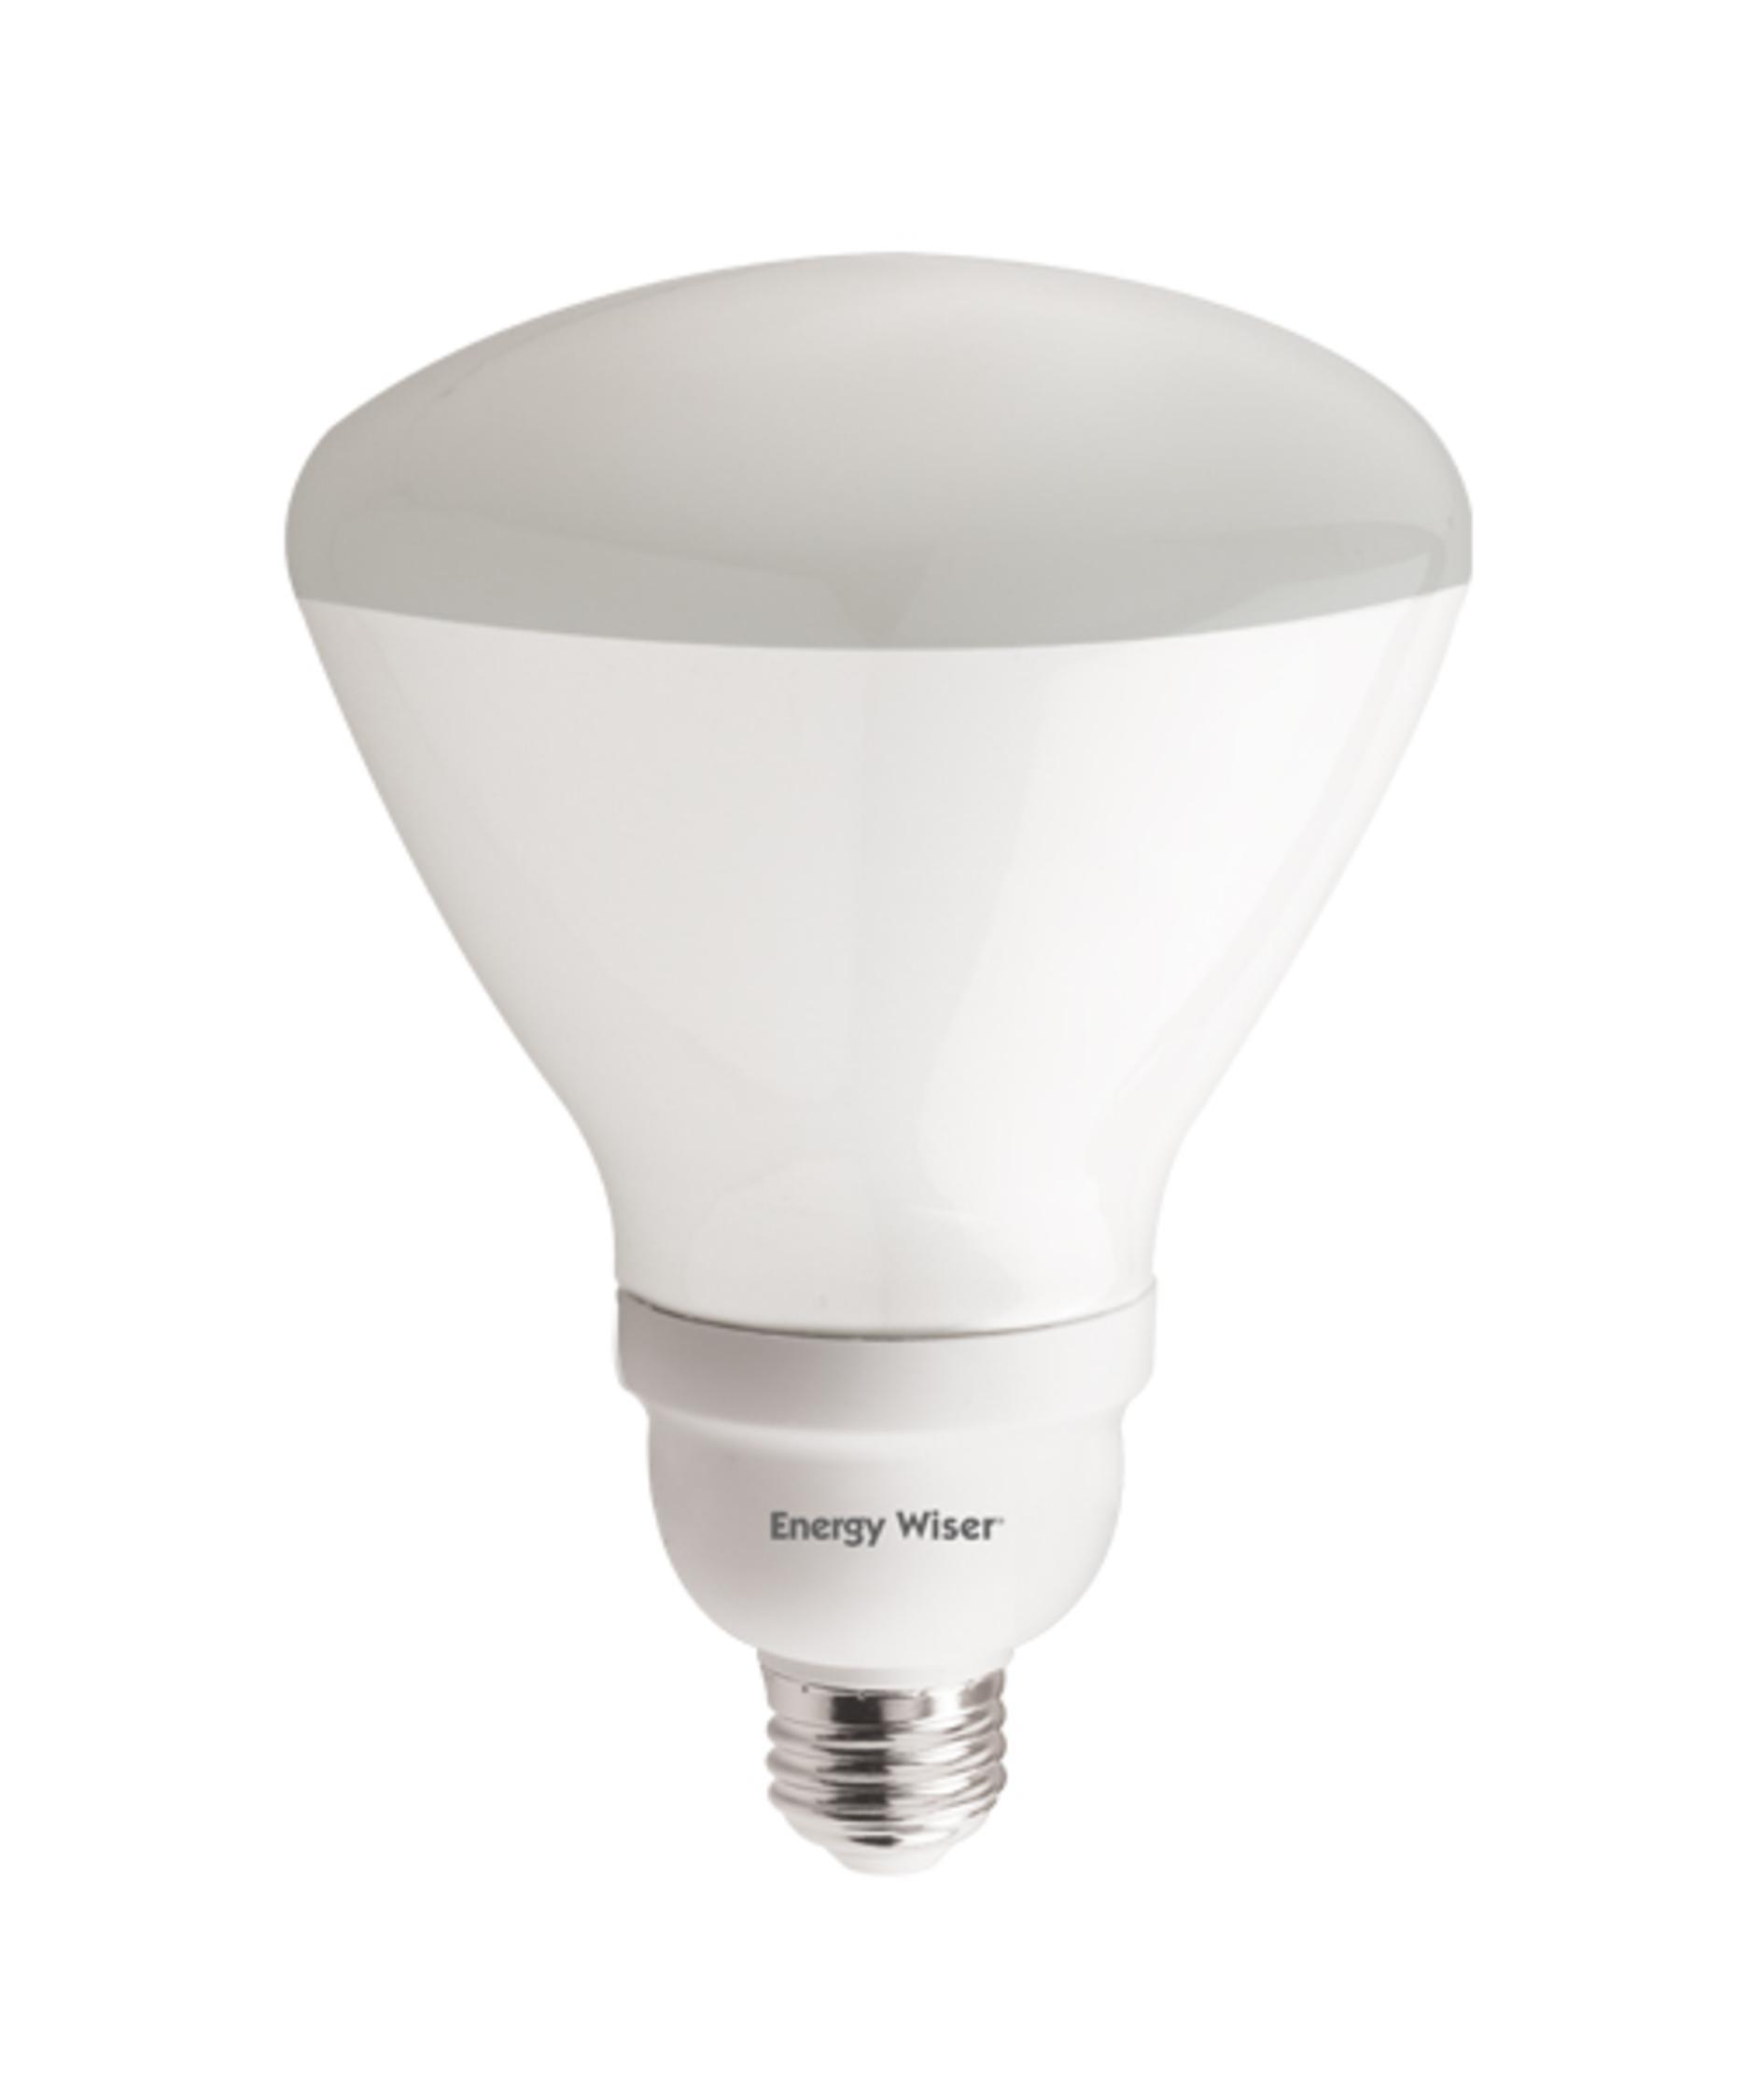 Bulbrite Cf23r40ww Dm 23 Watt R40 Warm White Dimmable Cfl Bulb Capitol Lighting 1